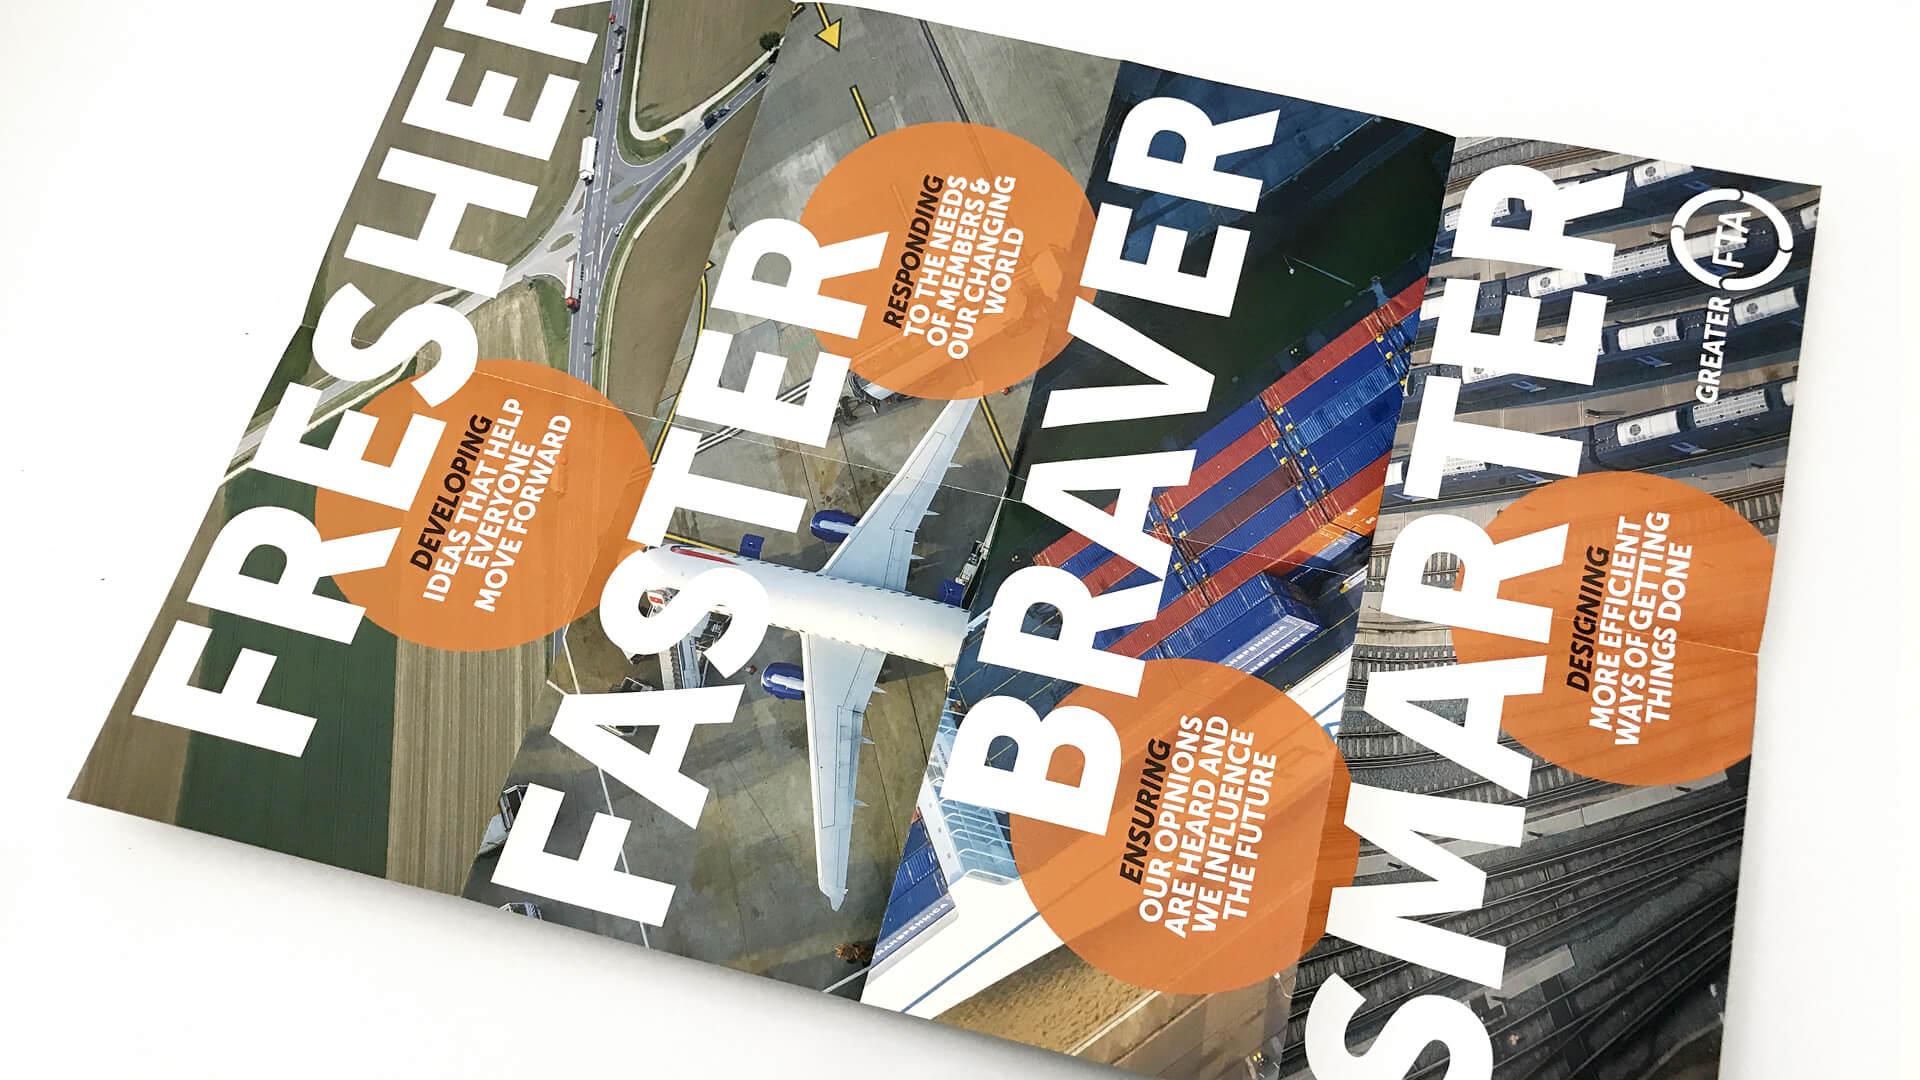 Freight transport association fta internal engagement brochure brand values